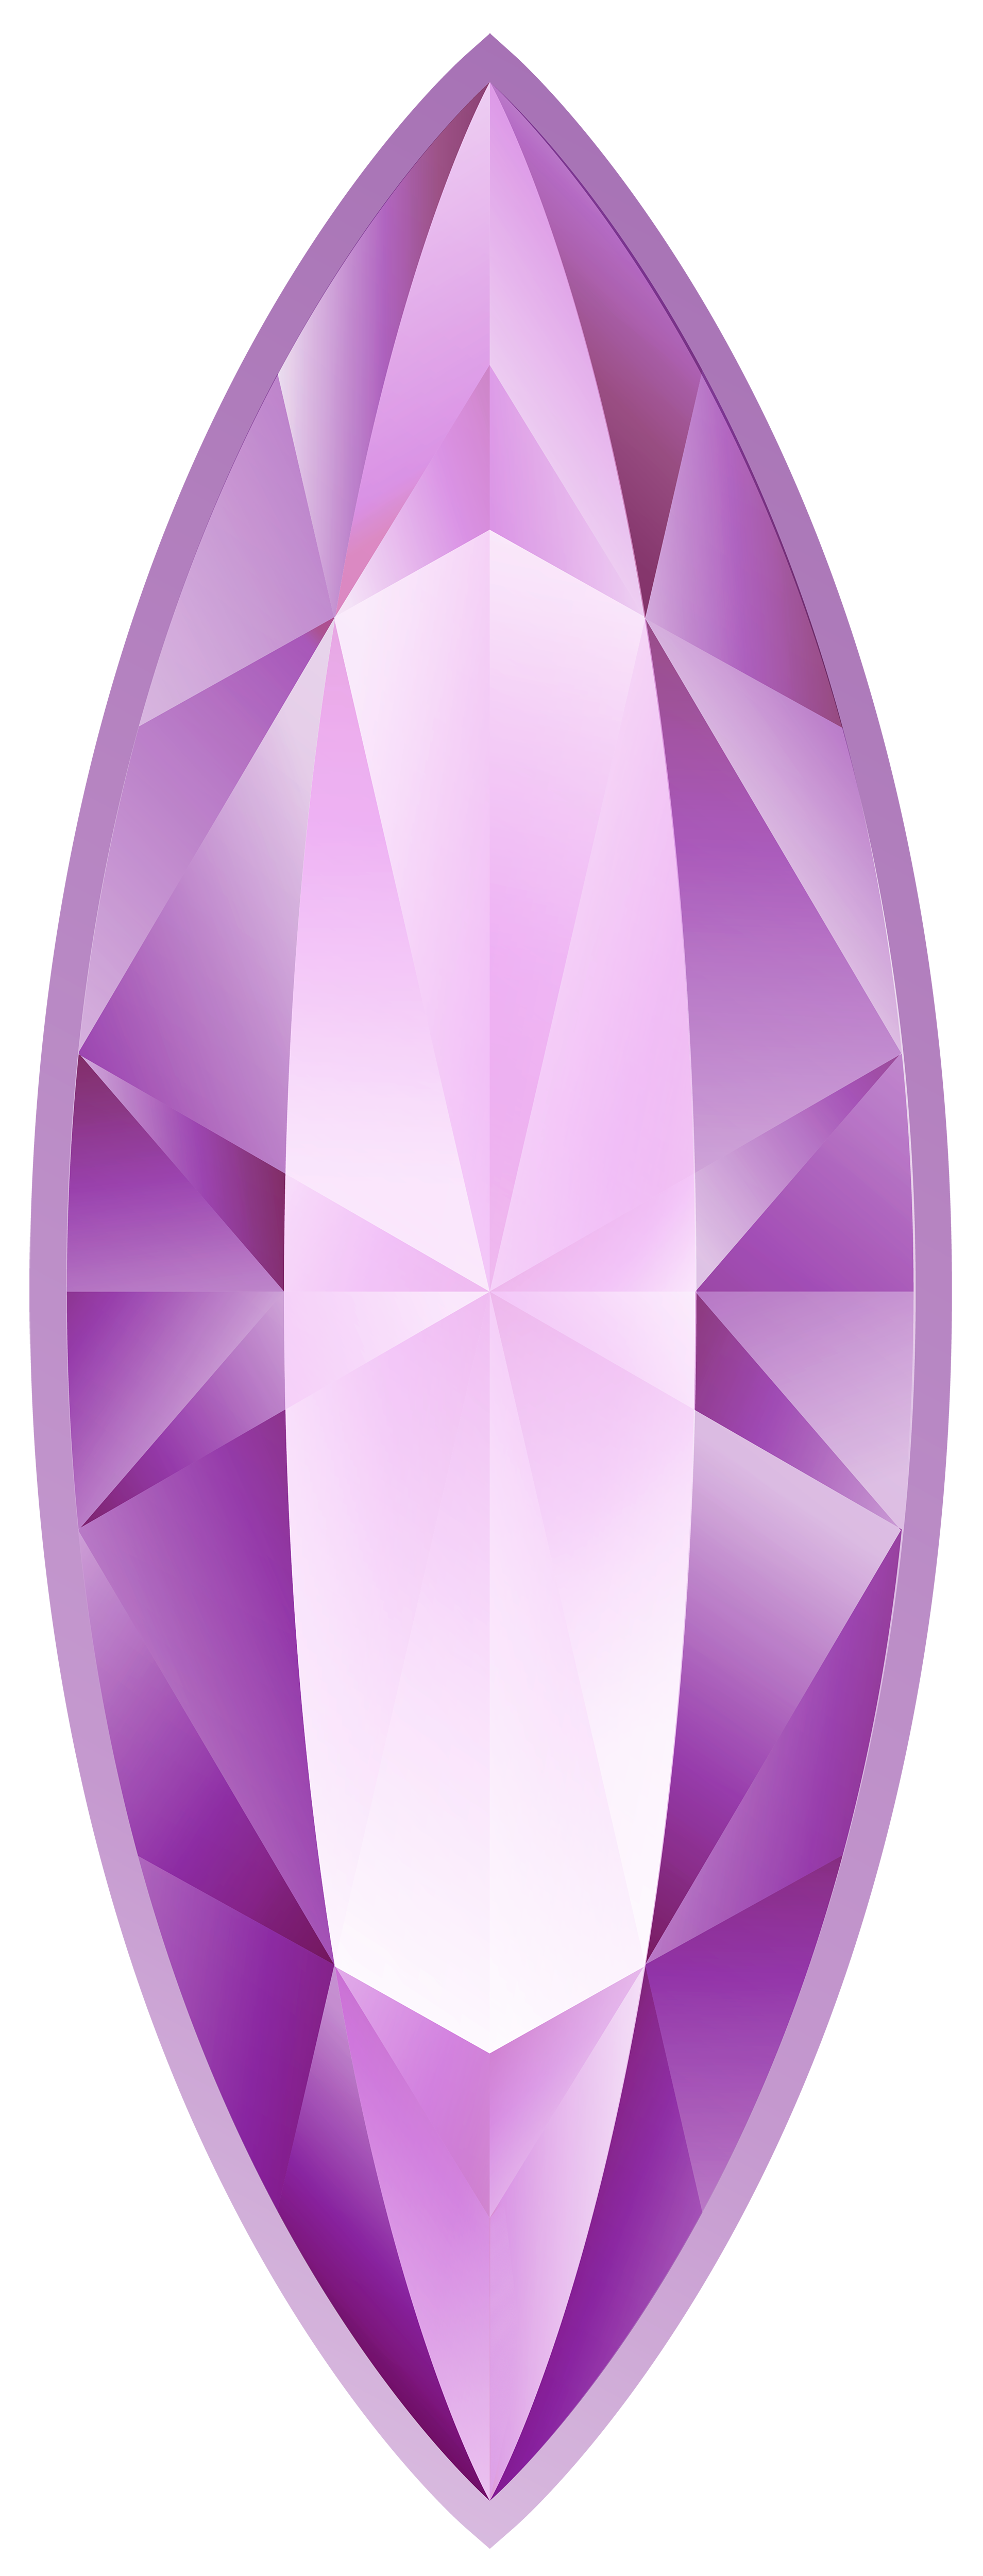 Diamond png clip art. Diamonds clipart purple